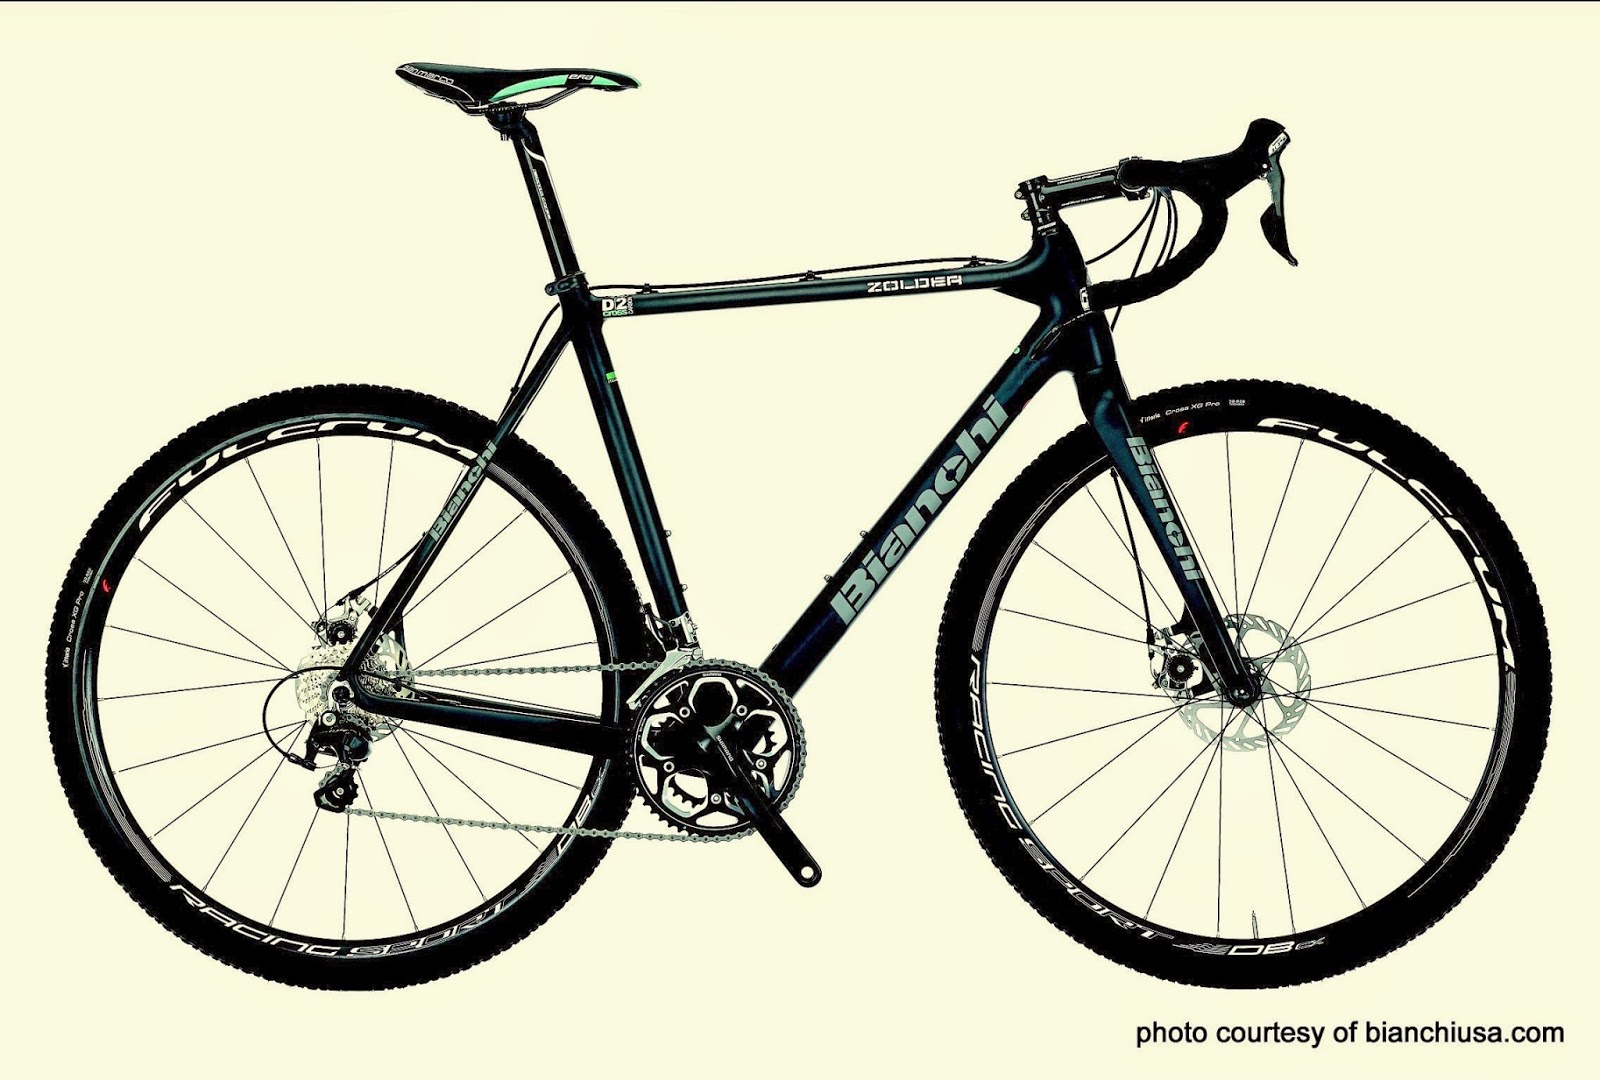 bianchi zolder, commuter, gravel, cyclocross, touring, trekking, adventure